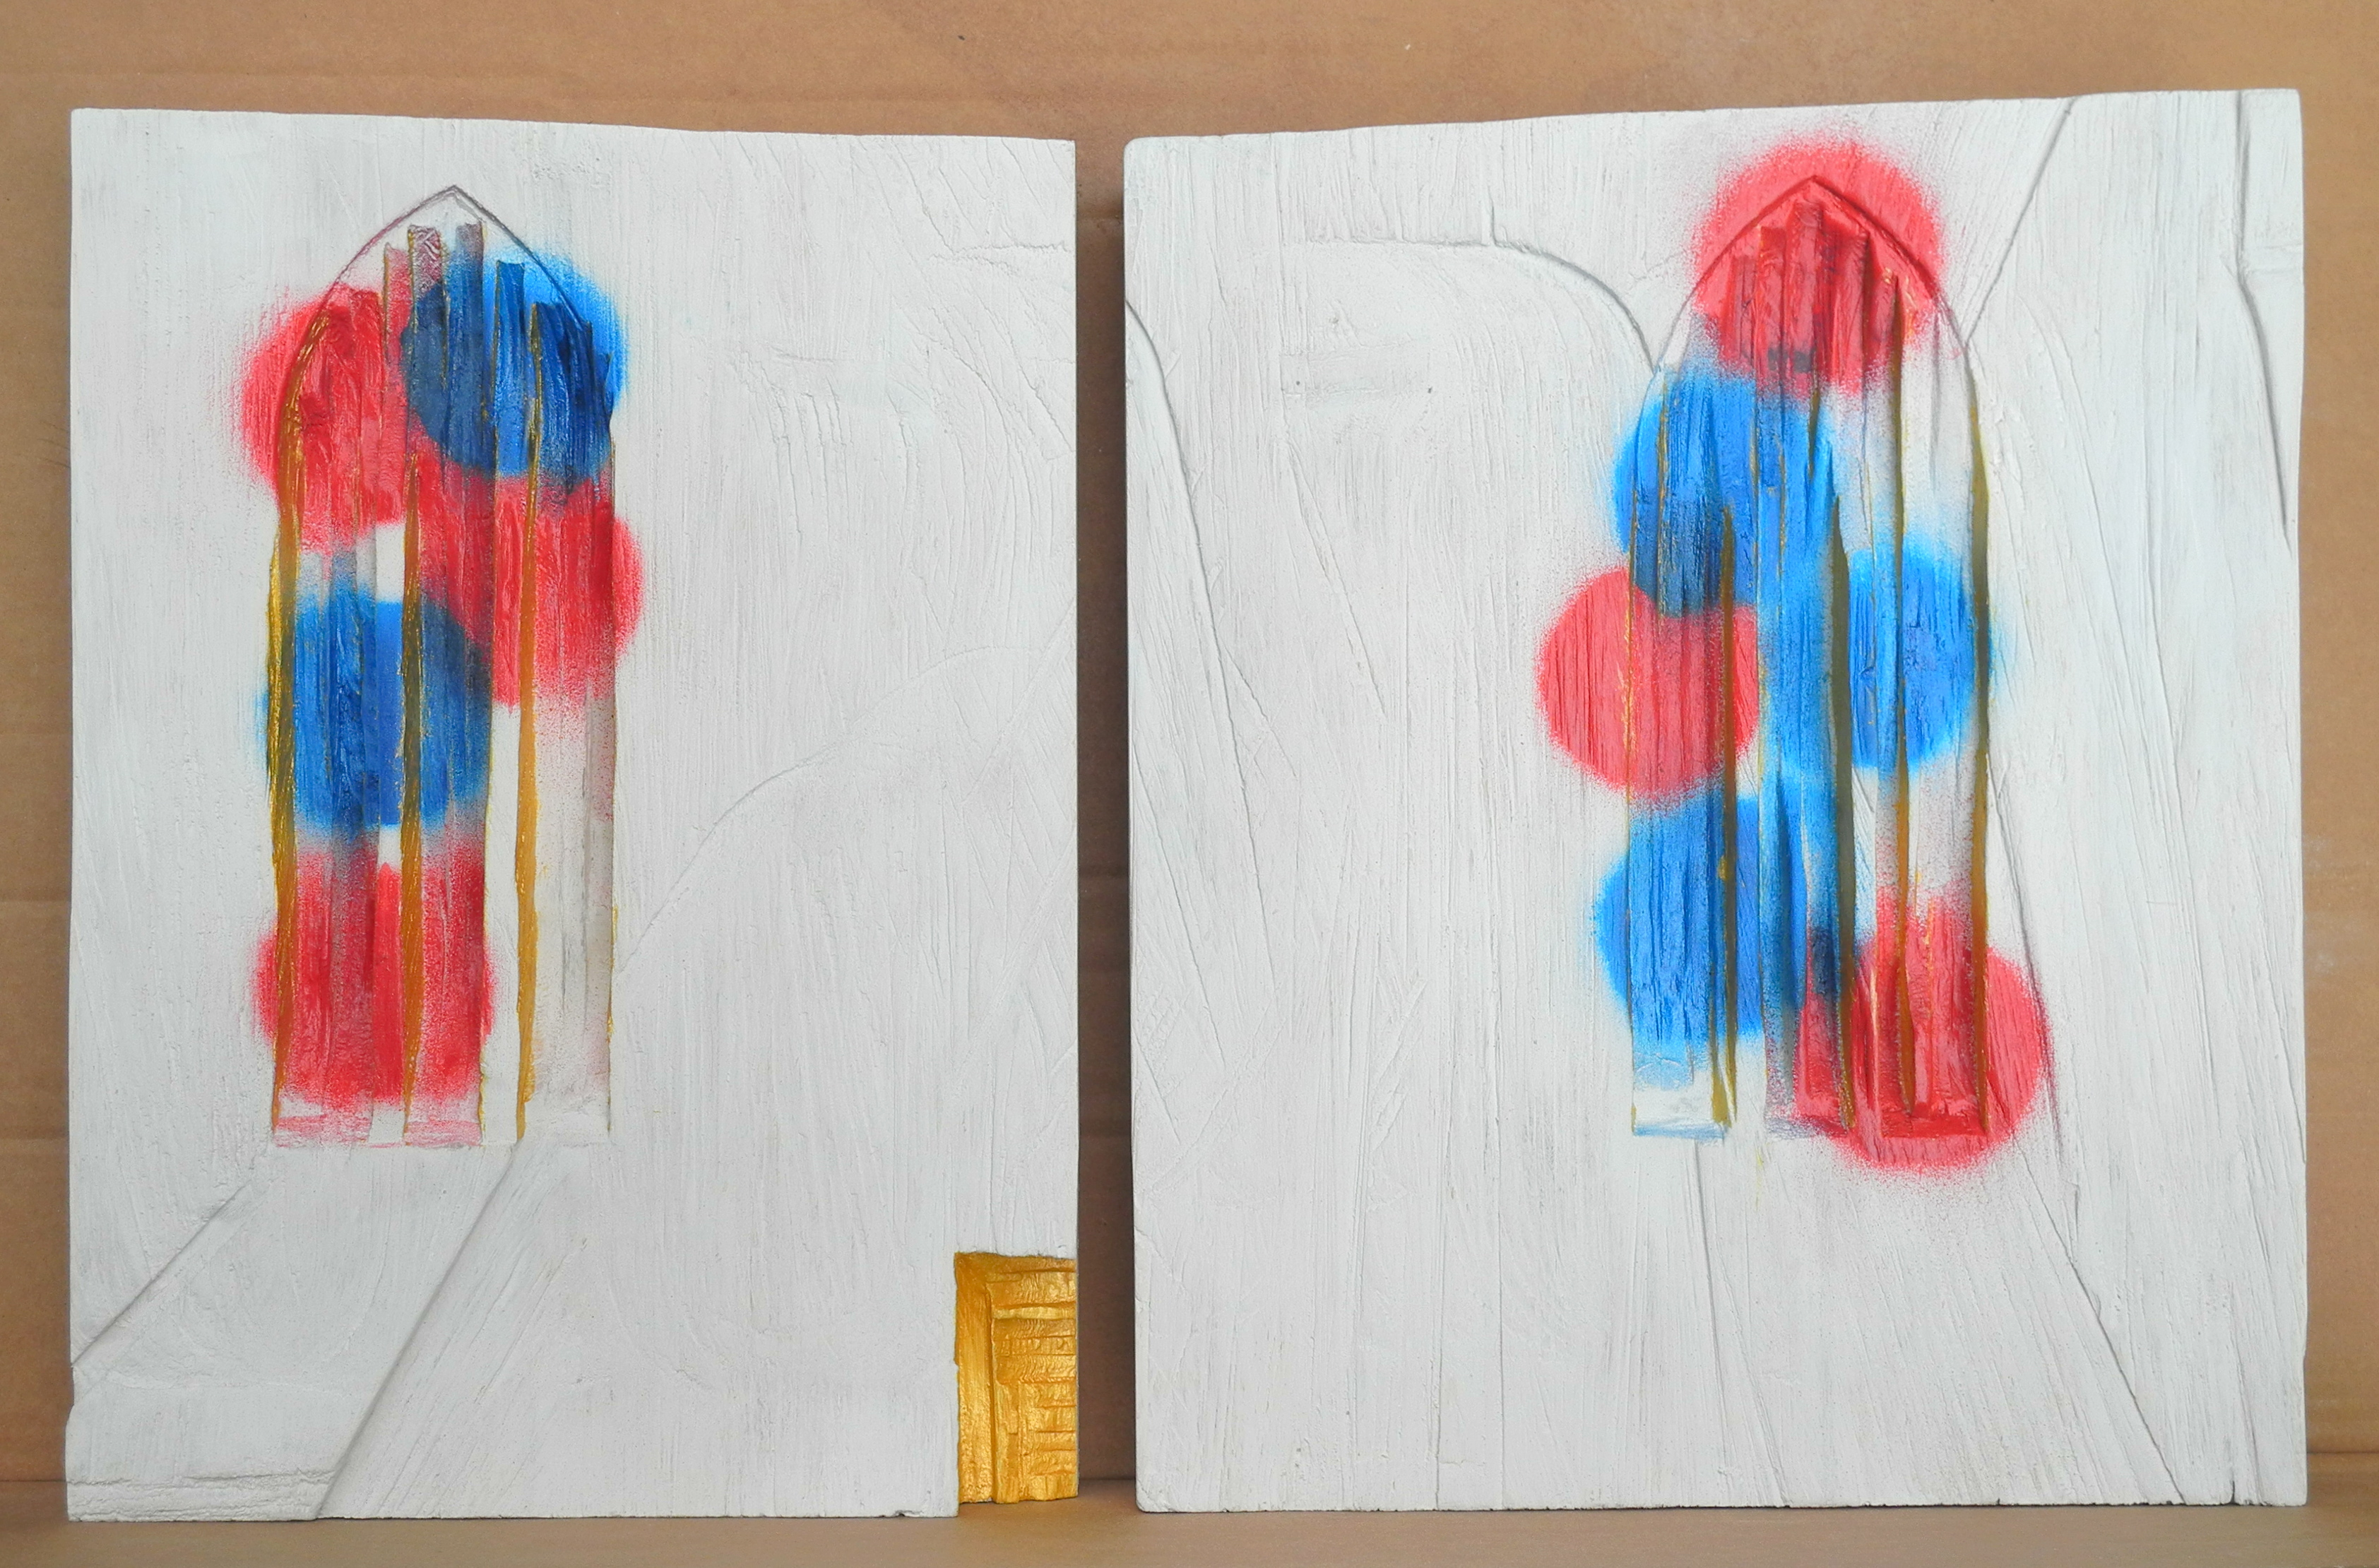 Bogenrelief I